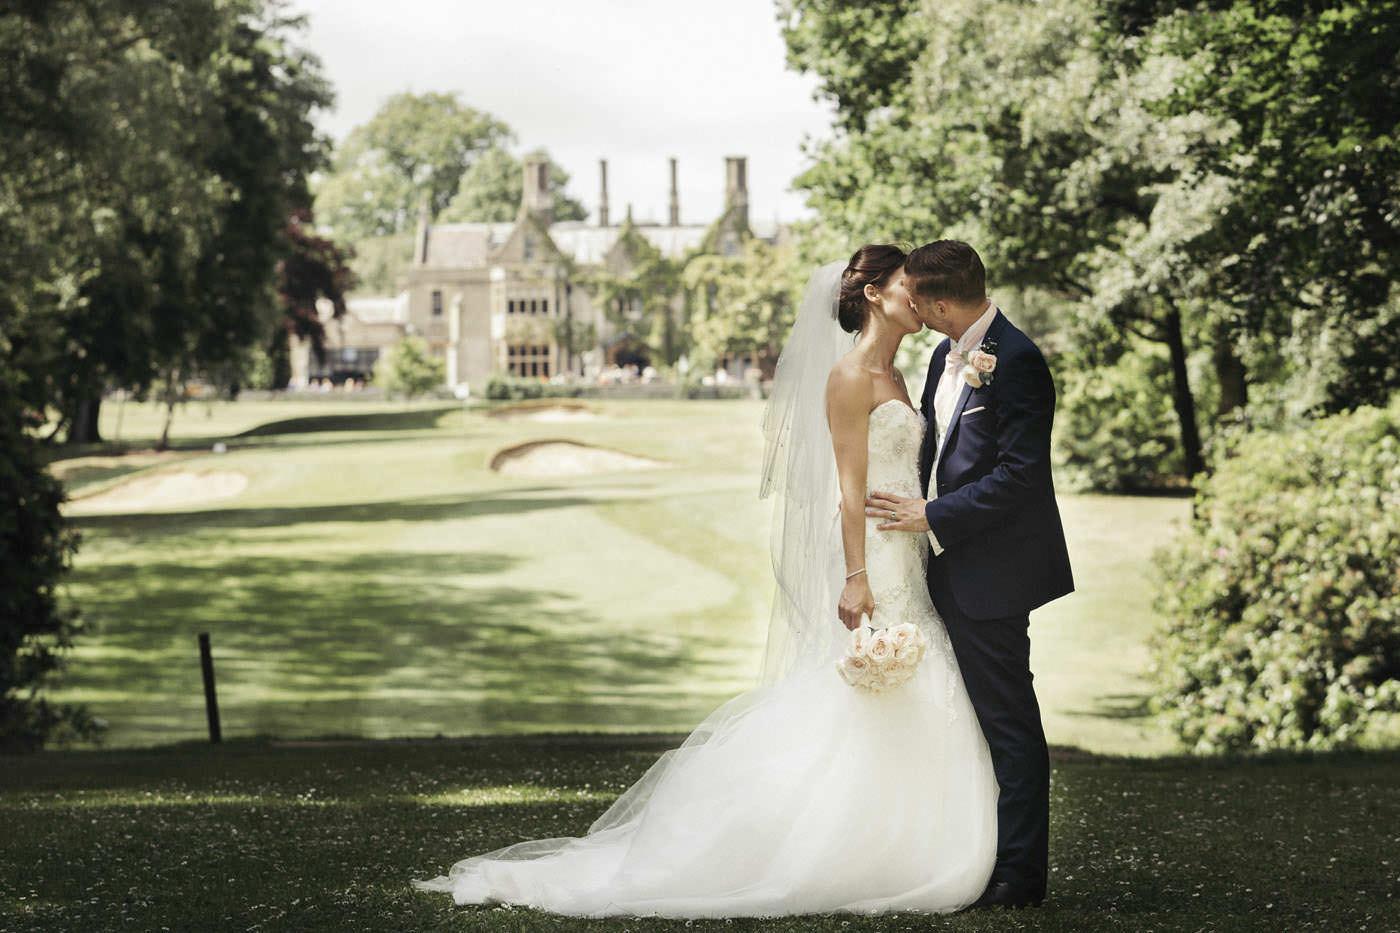 lukeemily foxhills wedding photographer 0071